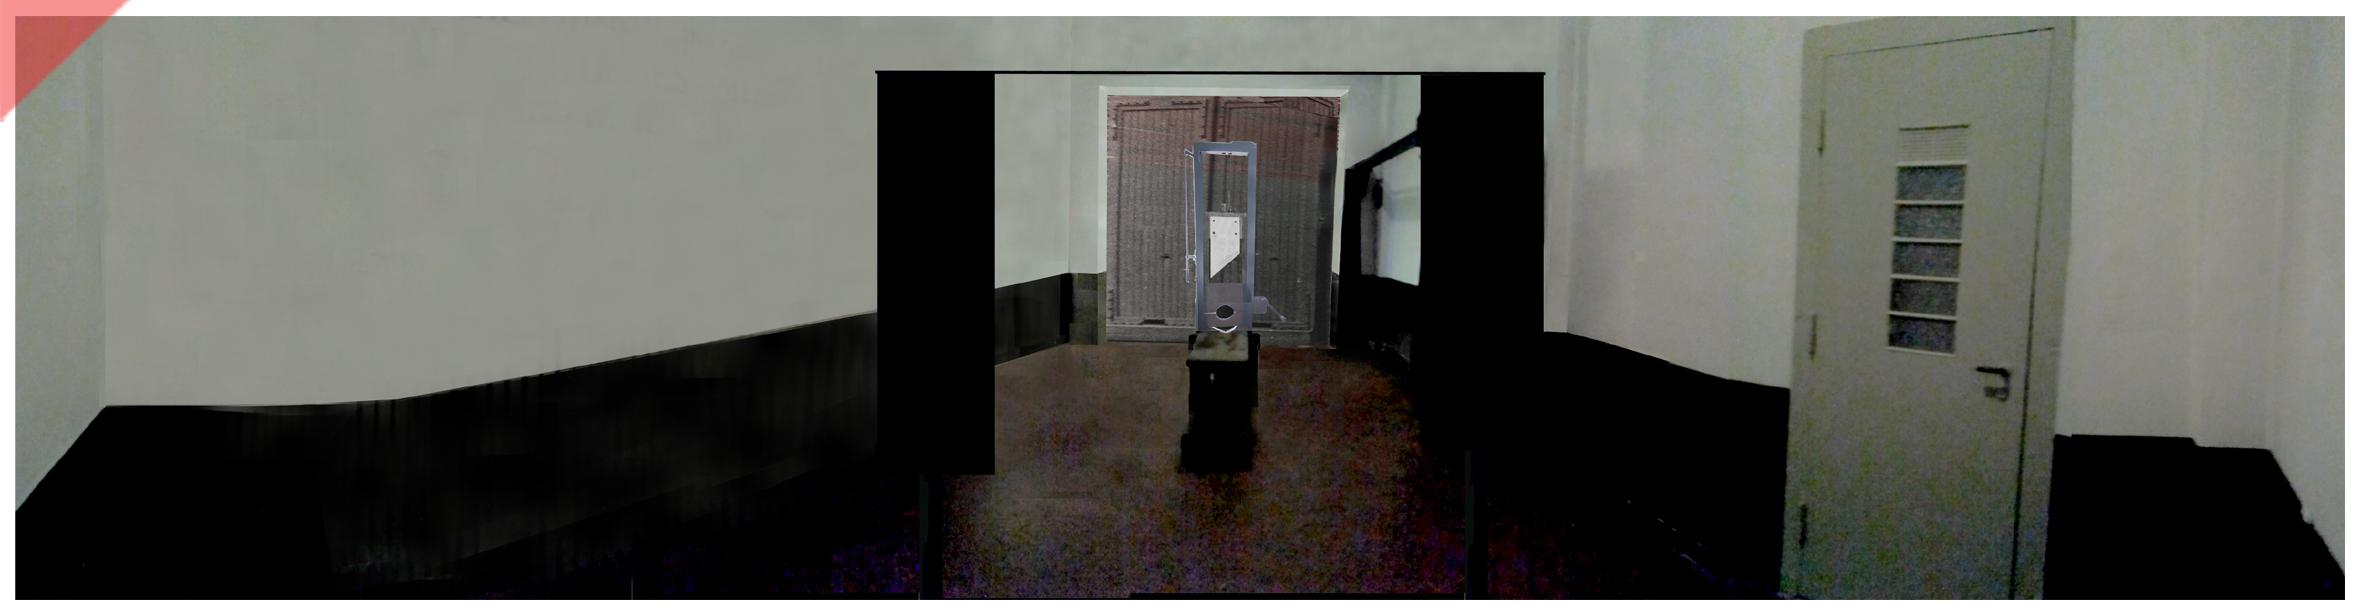 Brandenburg-Görden-Goerden-prison-German-Fallbeil-original-curtain-shorter-open-Modell-T-Mannhardt-Guillotine-Röttger-Roettger-Garage-Garagentor-1945-original